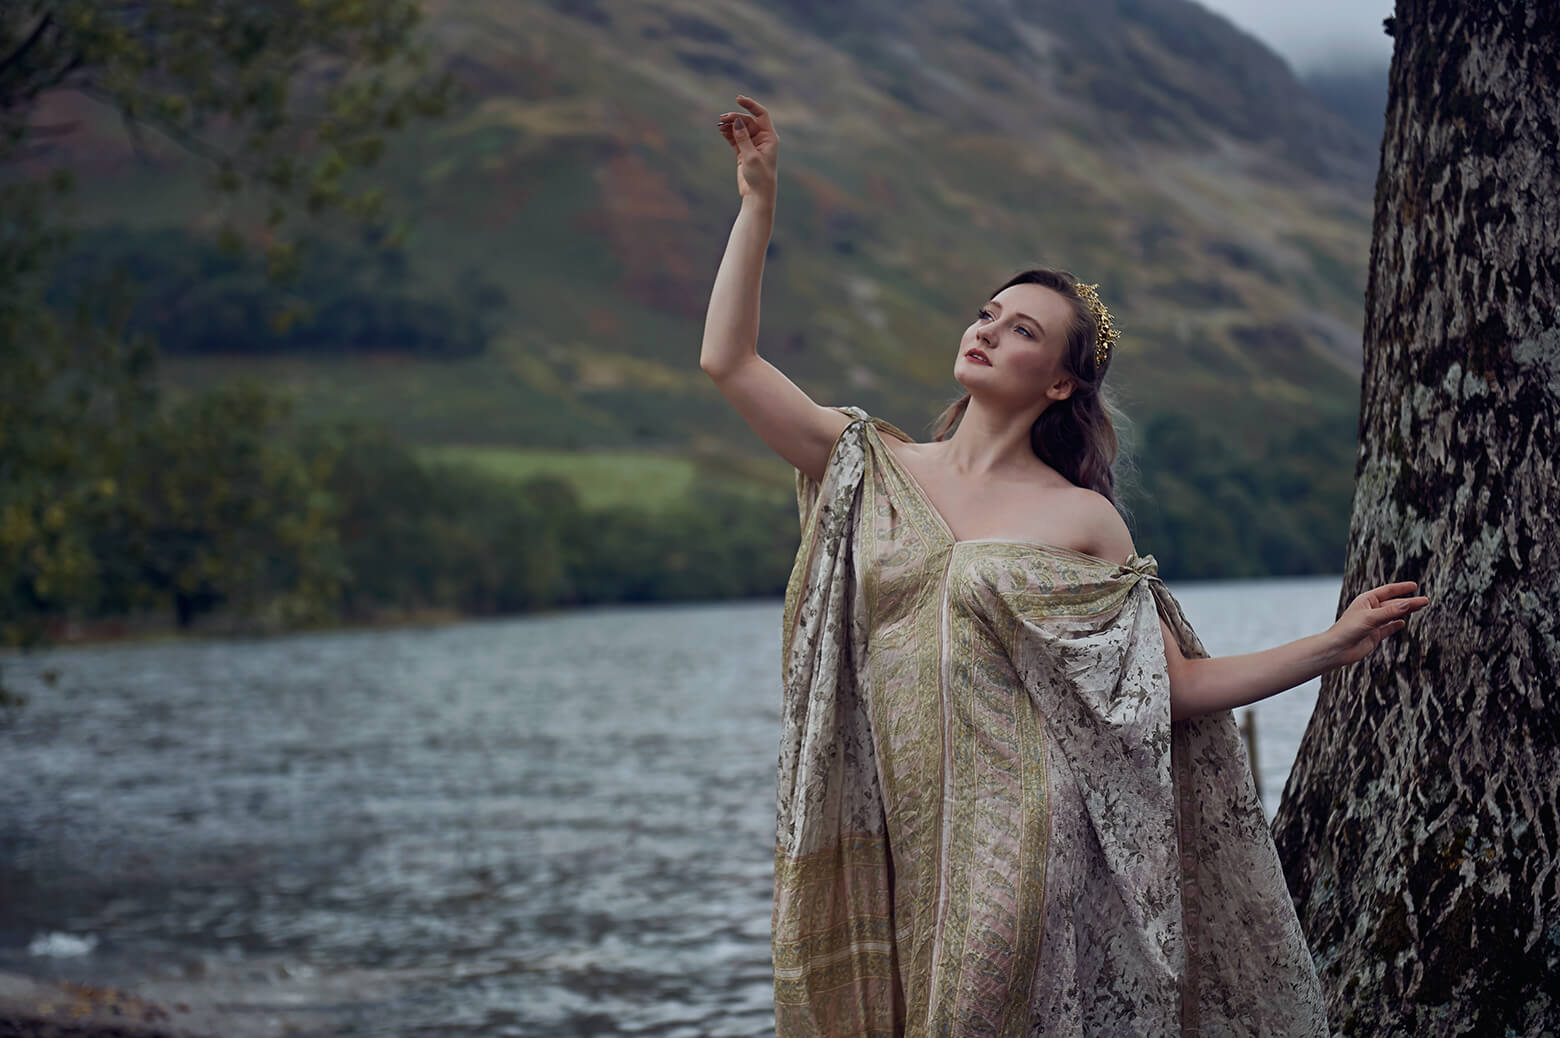 scotland, photography, ursula schmitz, portrait, destination, dream photo shoot, united kingdom, großbrittanien, urlaub, travel, fotografie, england, lake district, buttermere